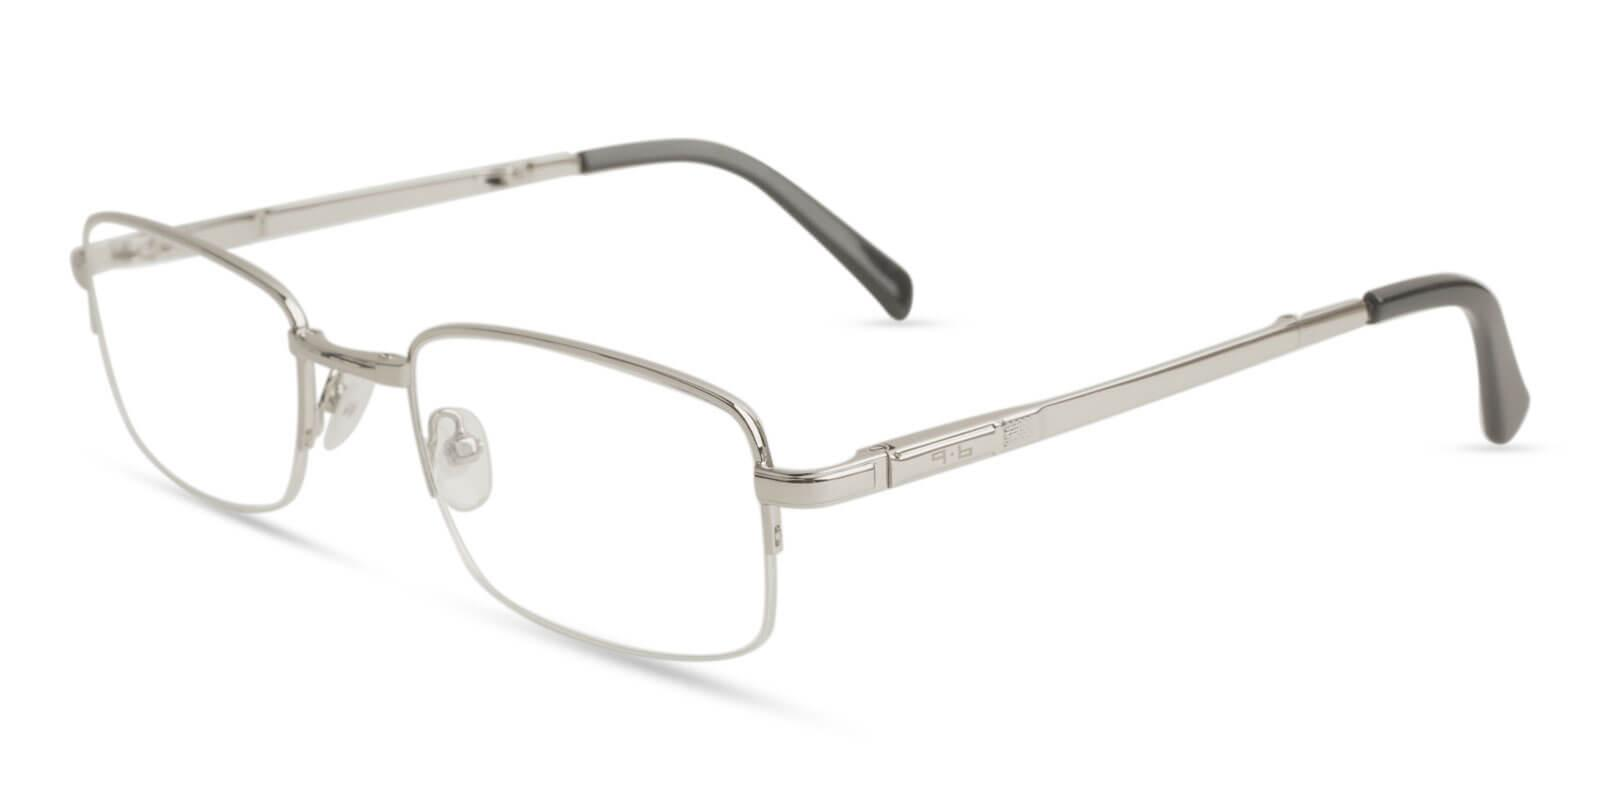 Carson Silver Metal Eyeglasses , Foldable , NosePads Frames from ABBE Glasses